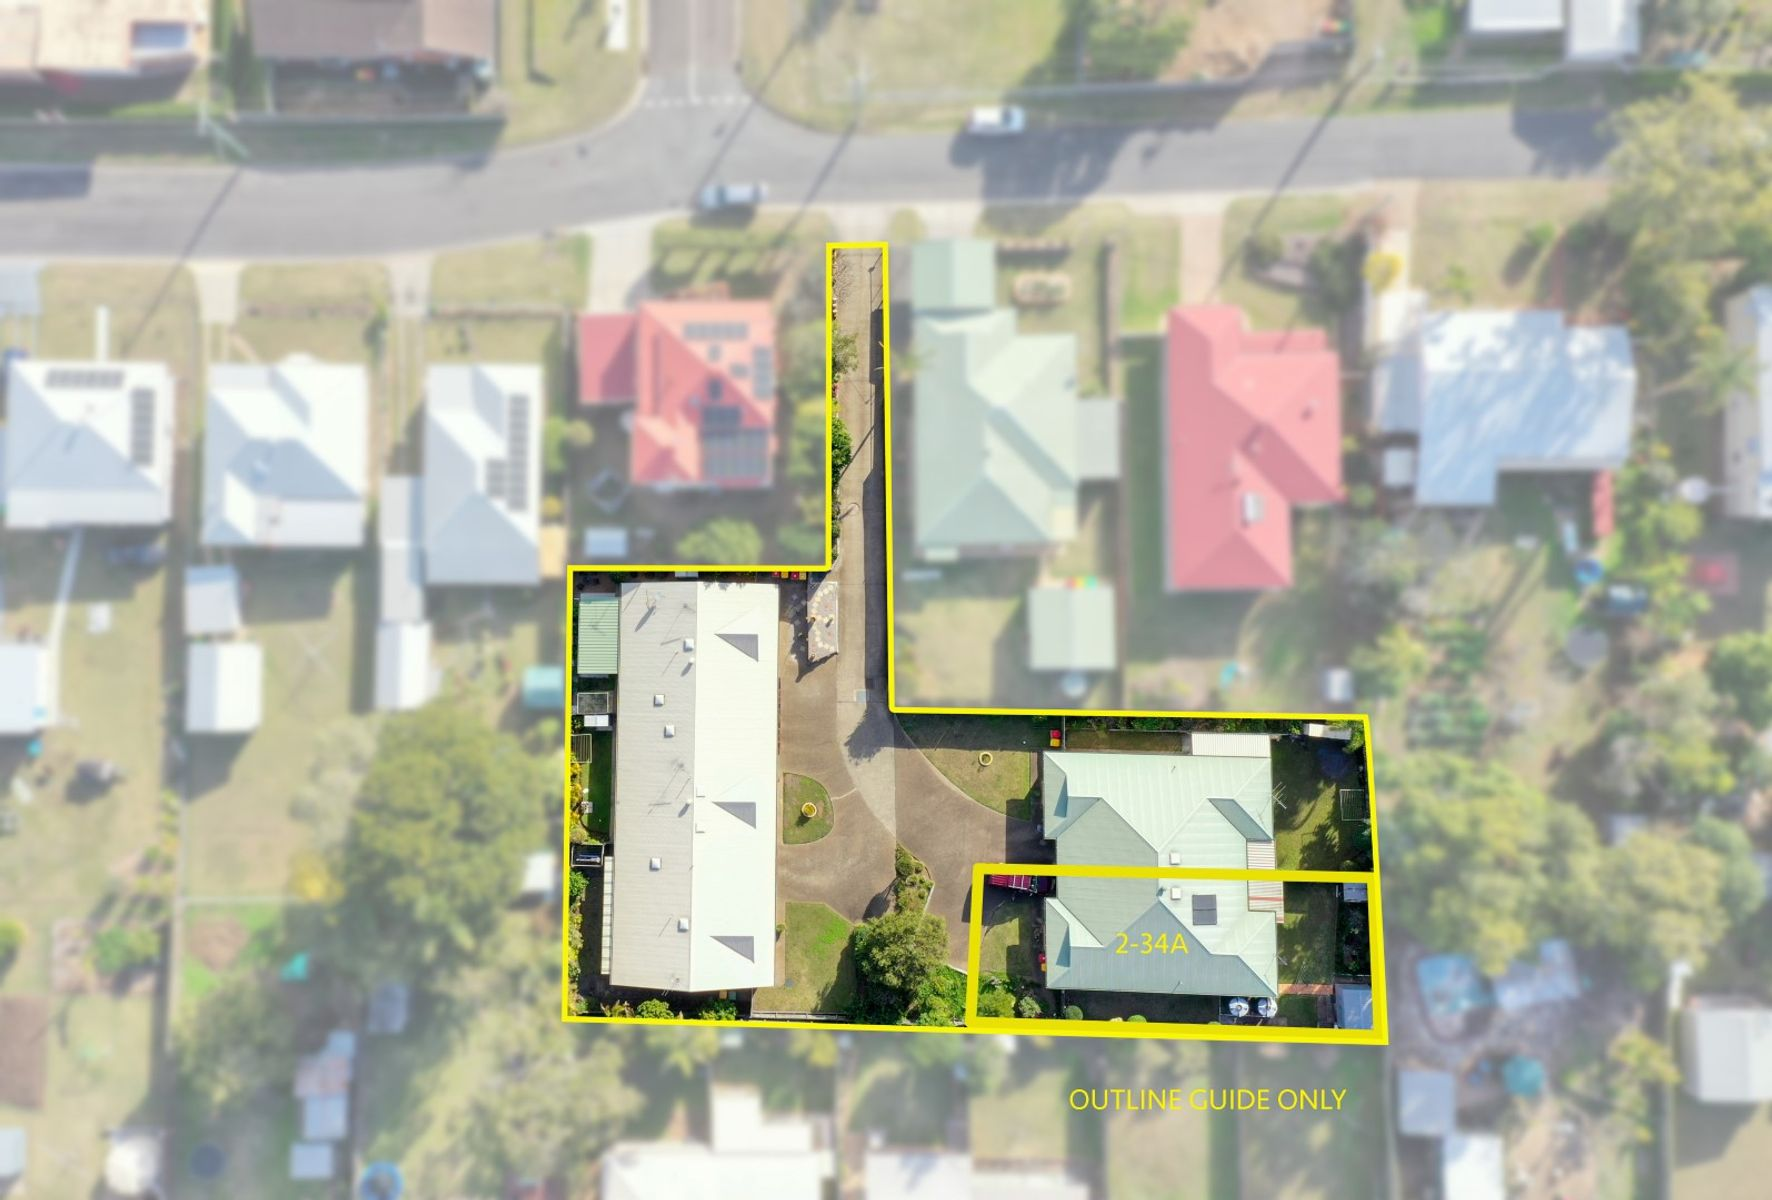 2/34A McGrath Lane, Booval, QLD 4304